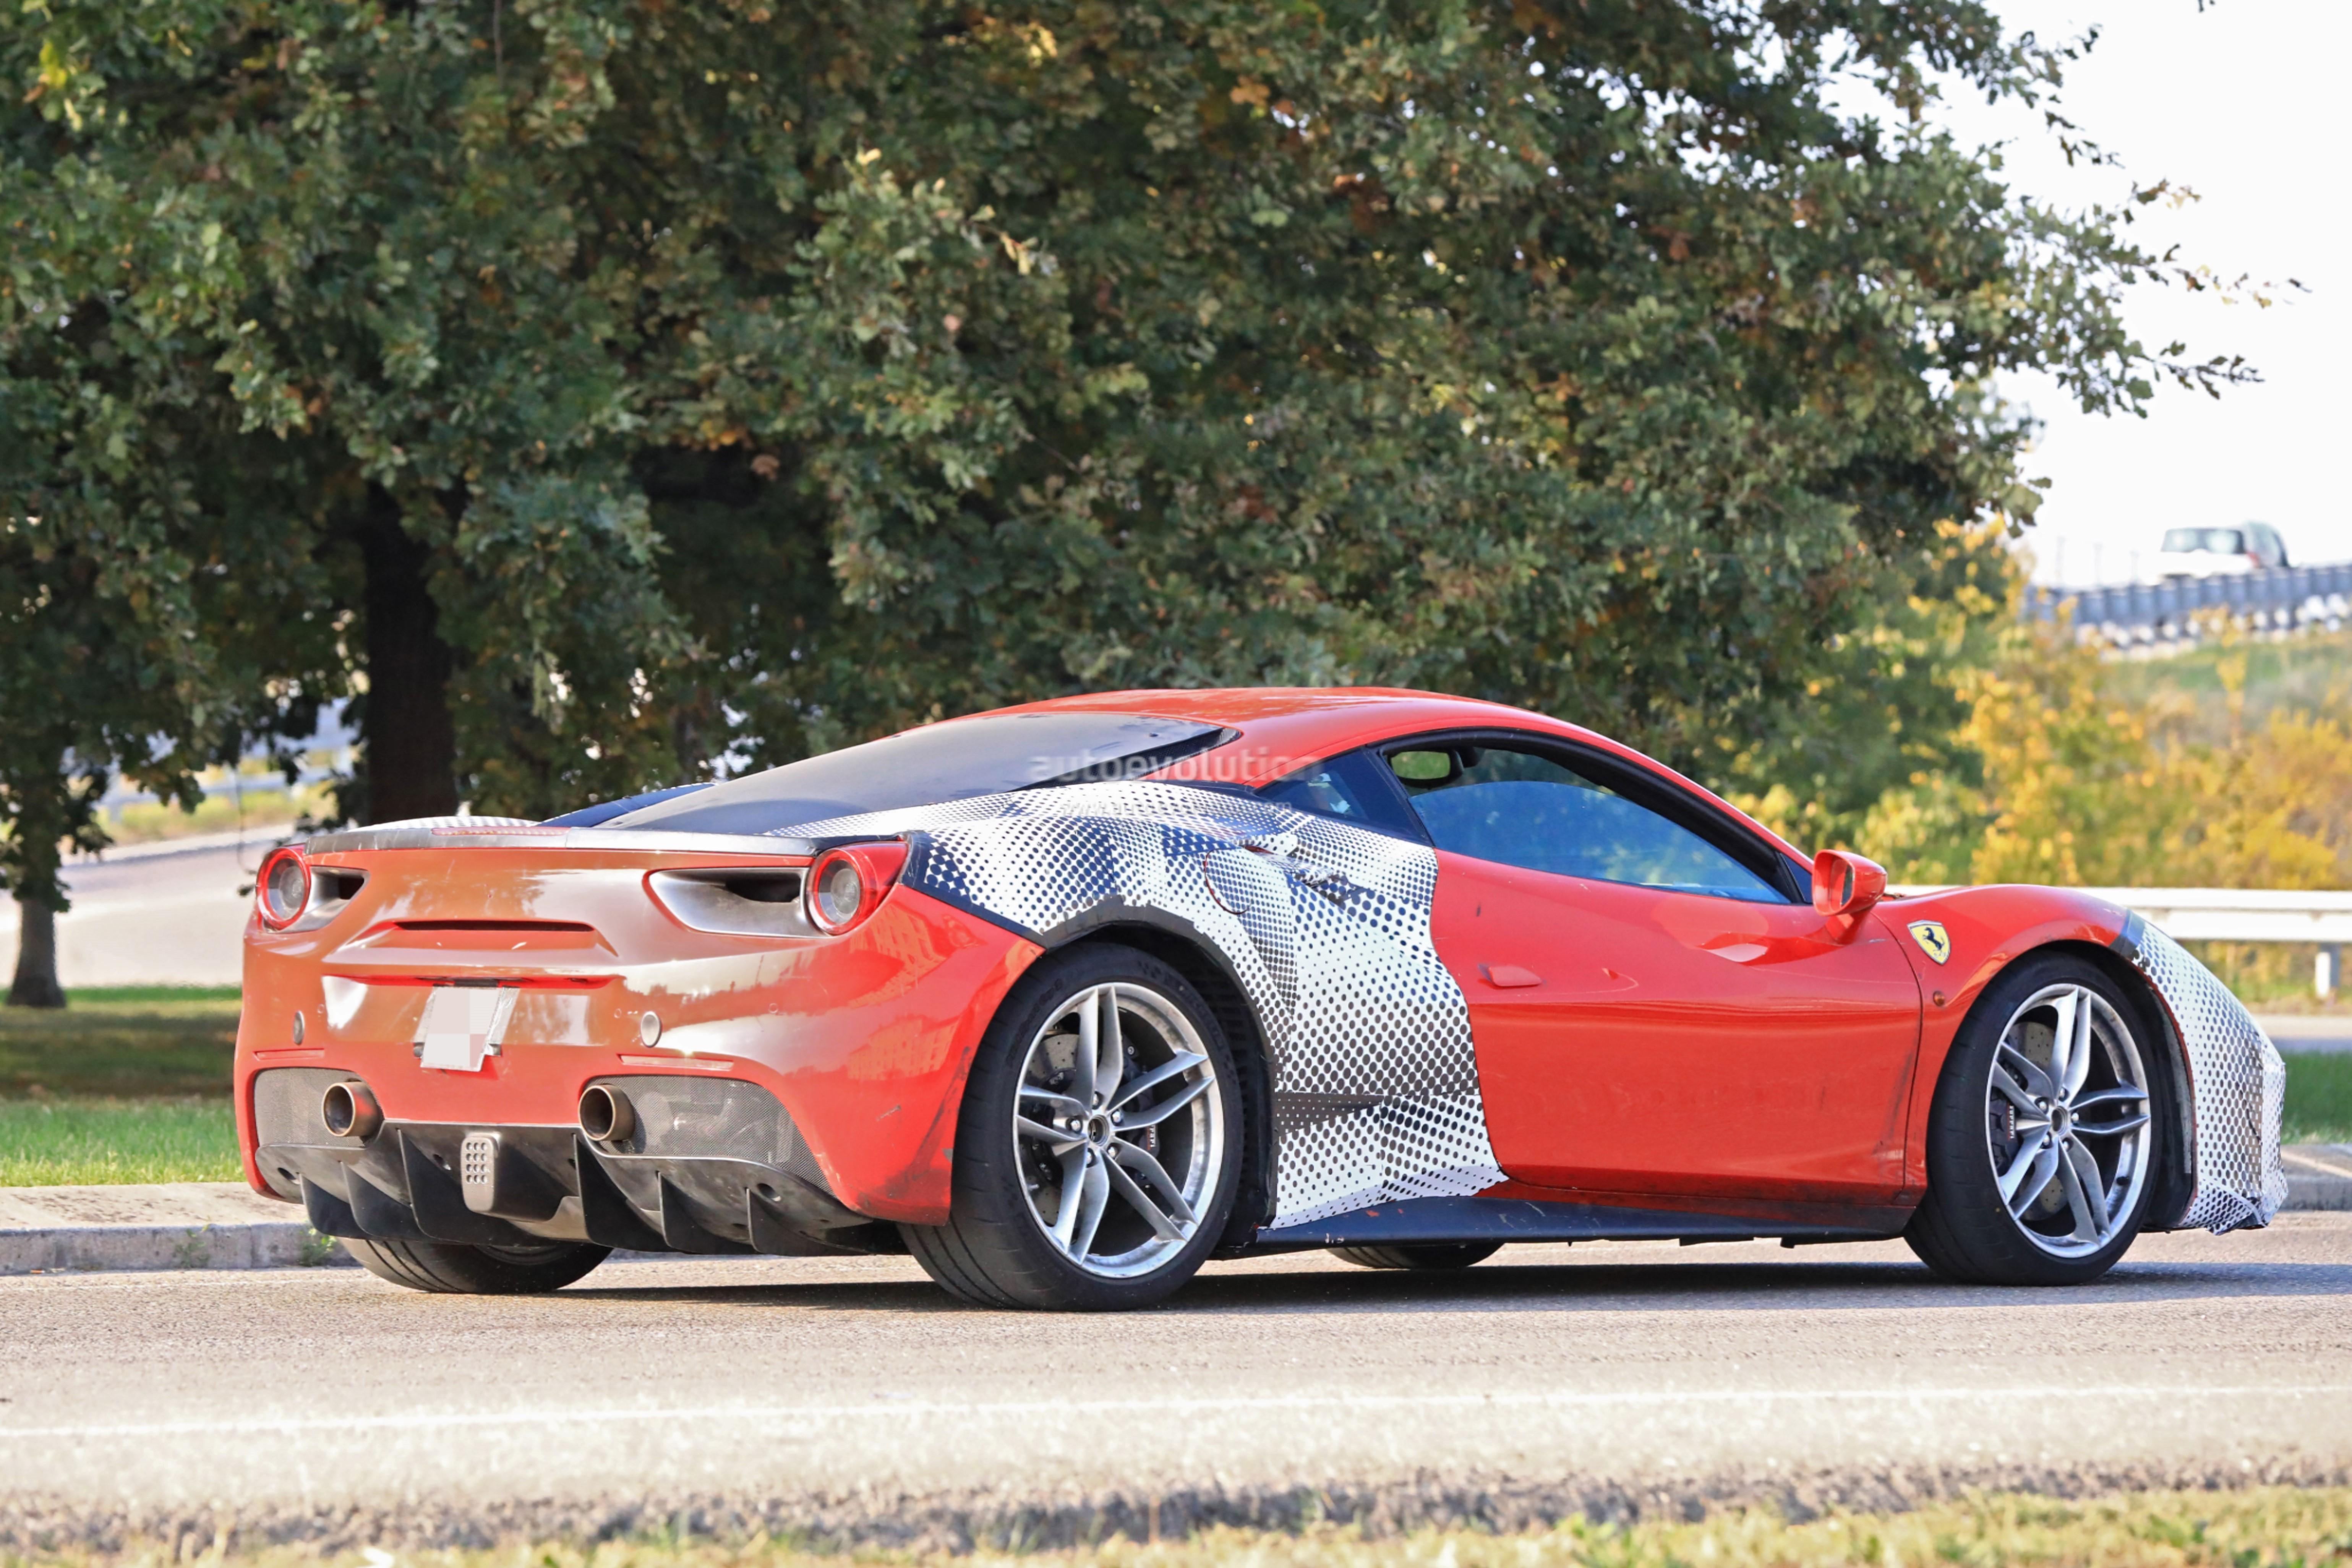 2019 Ferrari 488 Gto Has Most Powerful V8 Engine In